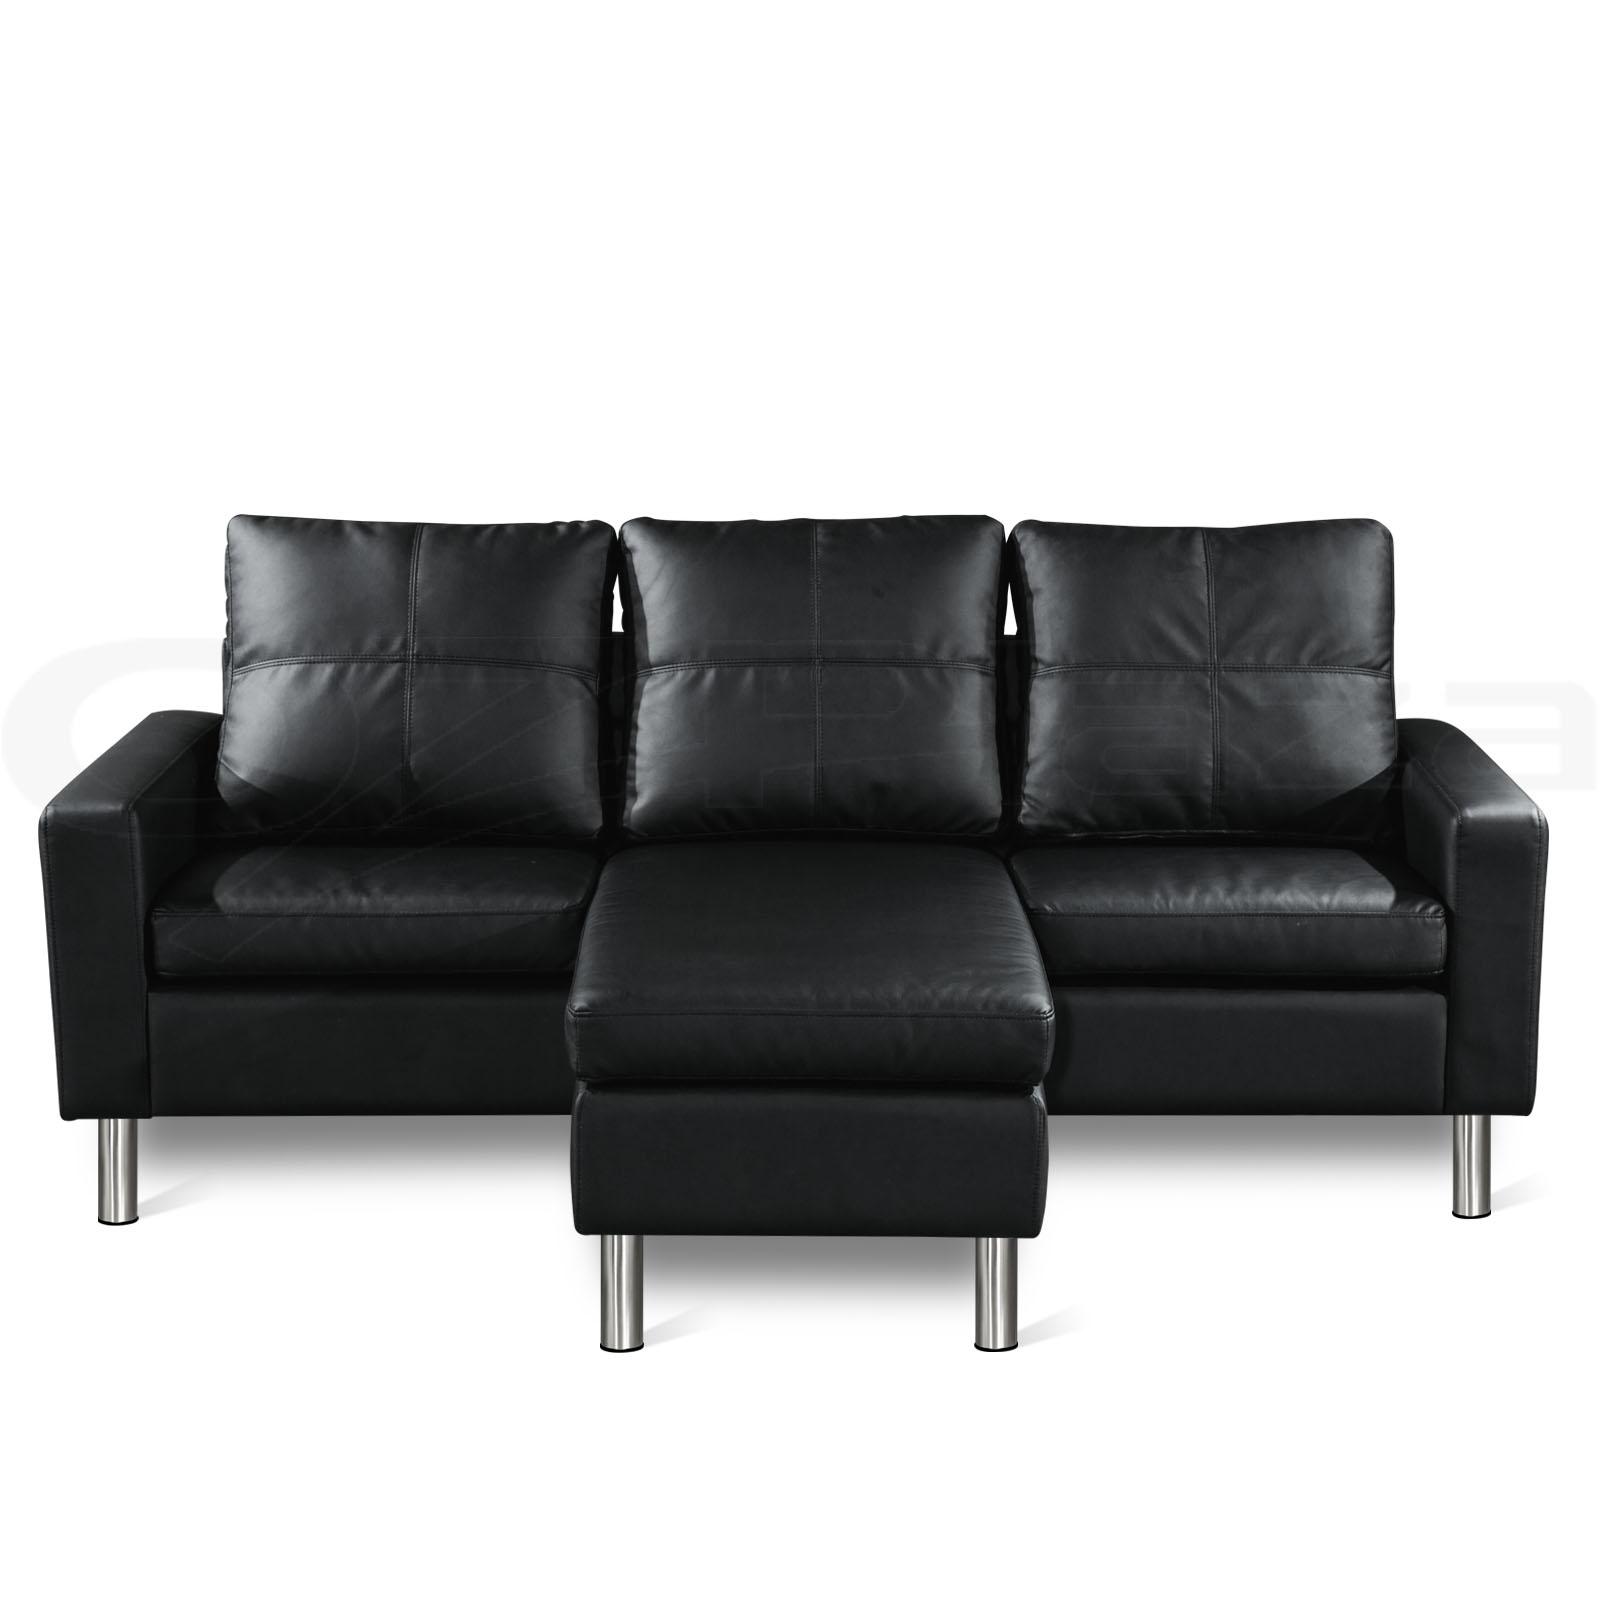 Pu Leather Sofa Modular Lounge Suite Chaise Double Futon